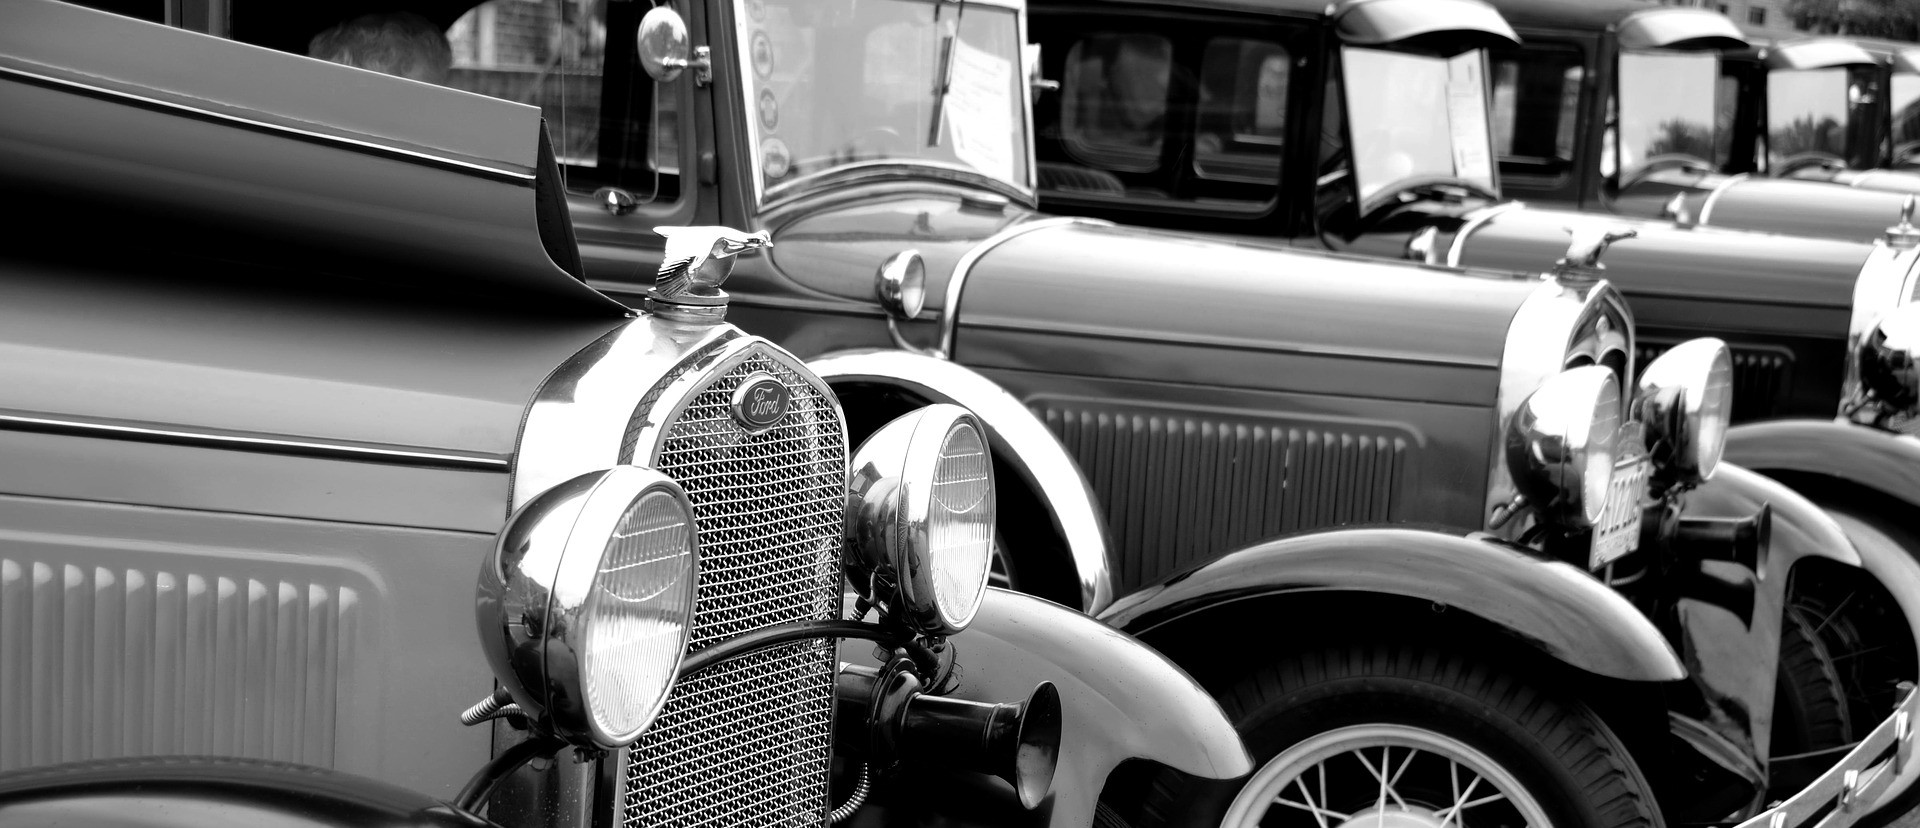 Kentucky Car Donations | Breast Cancer Car Donations